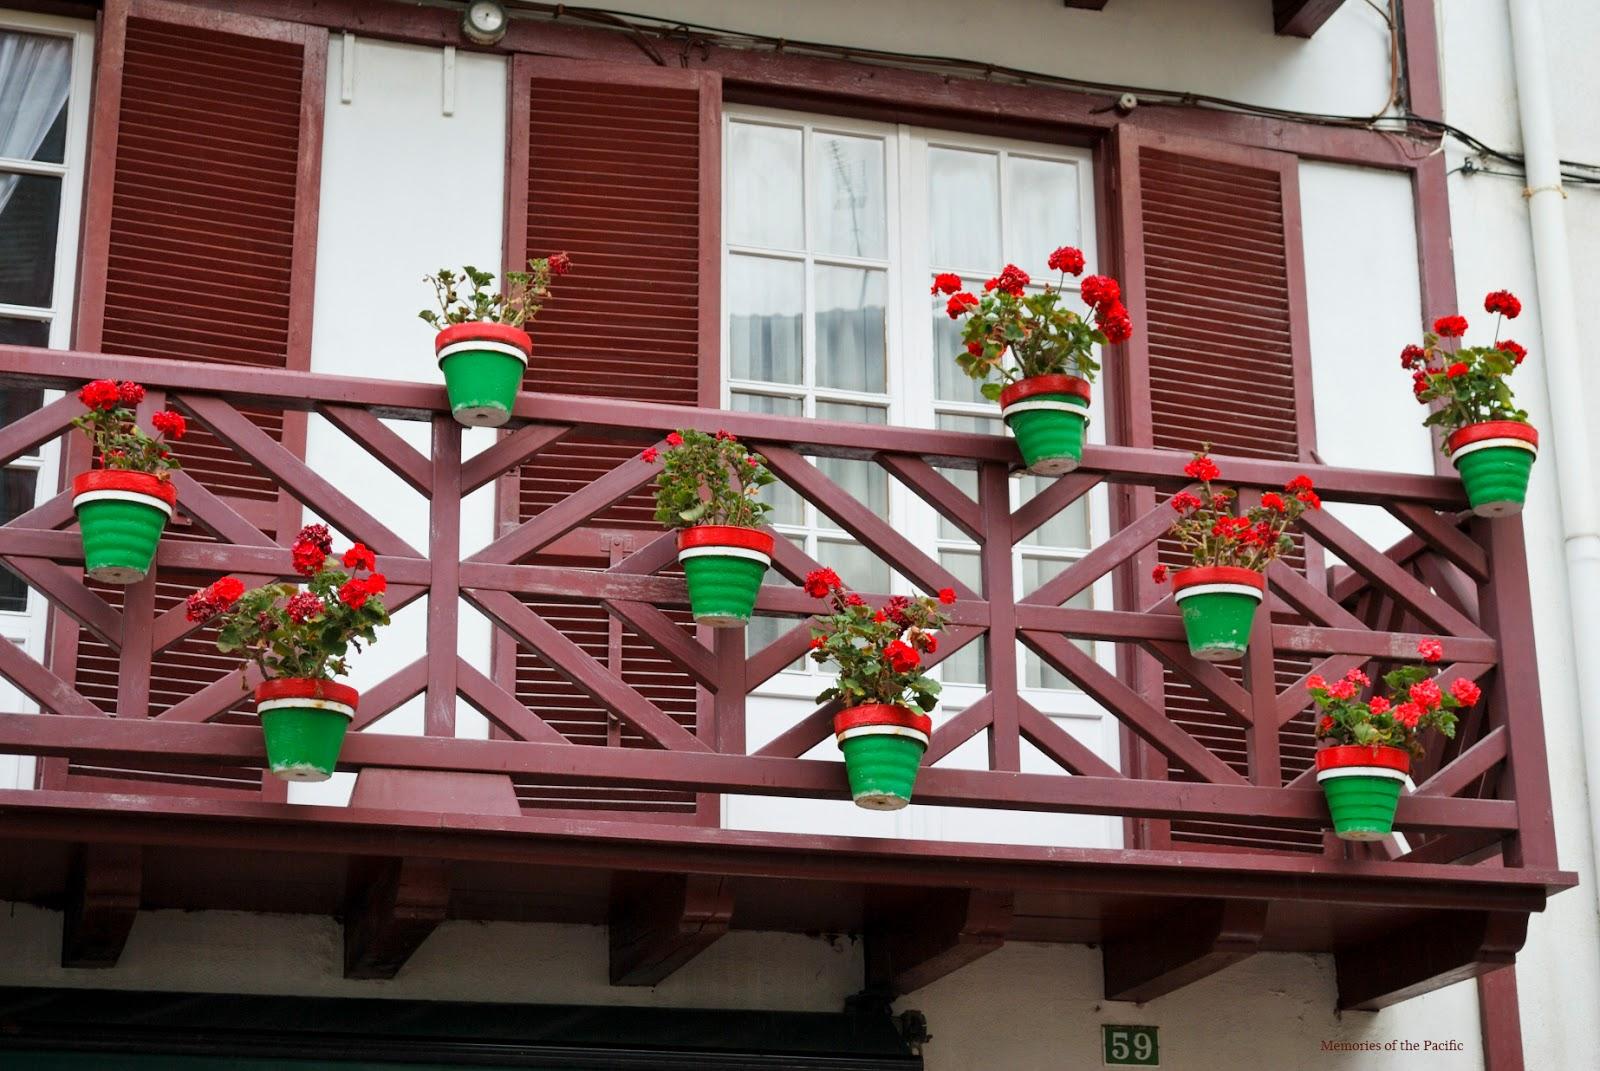 hondarribia basque country spain san sebastian travel blog